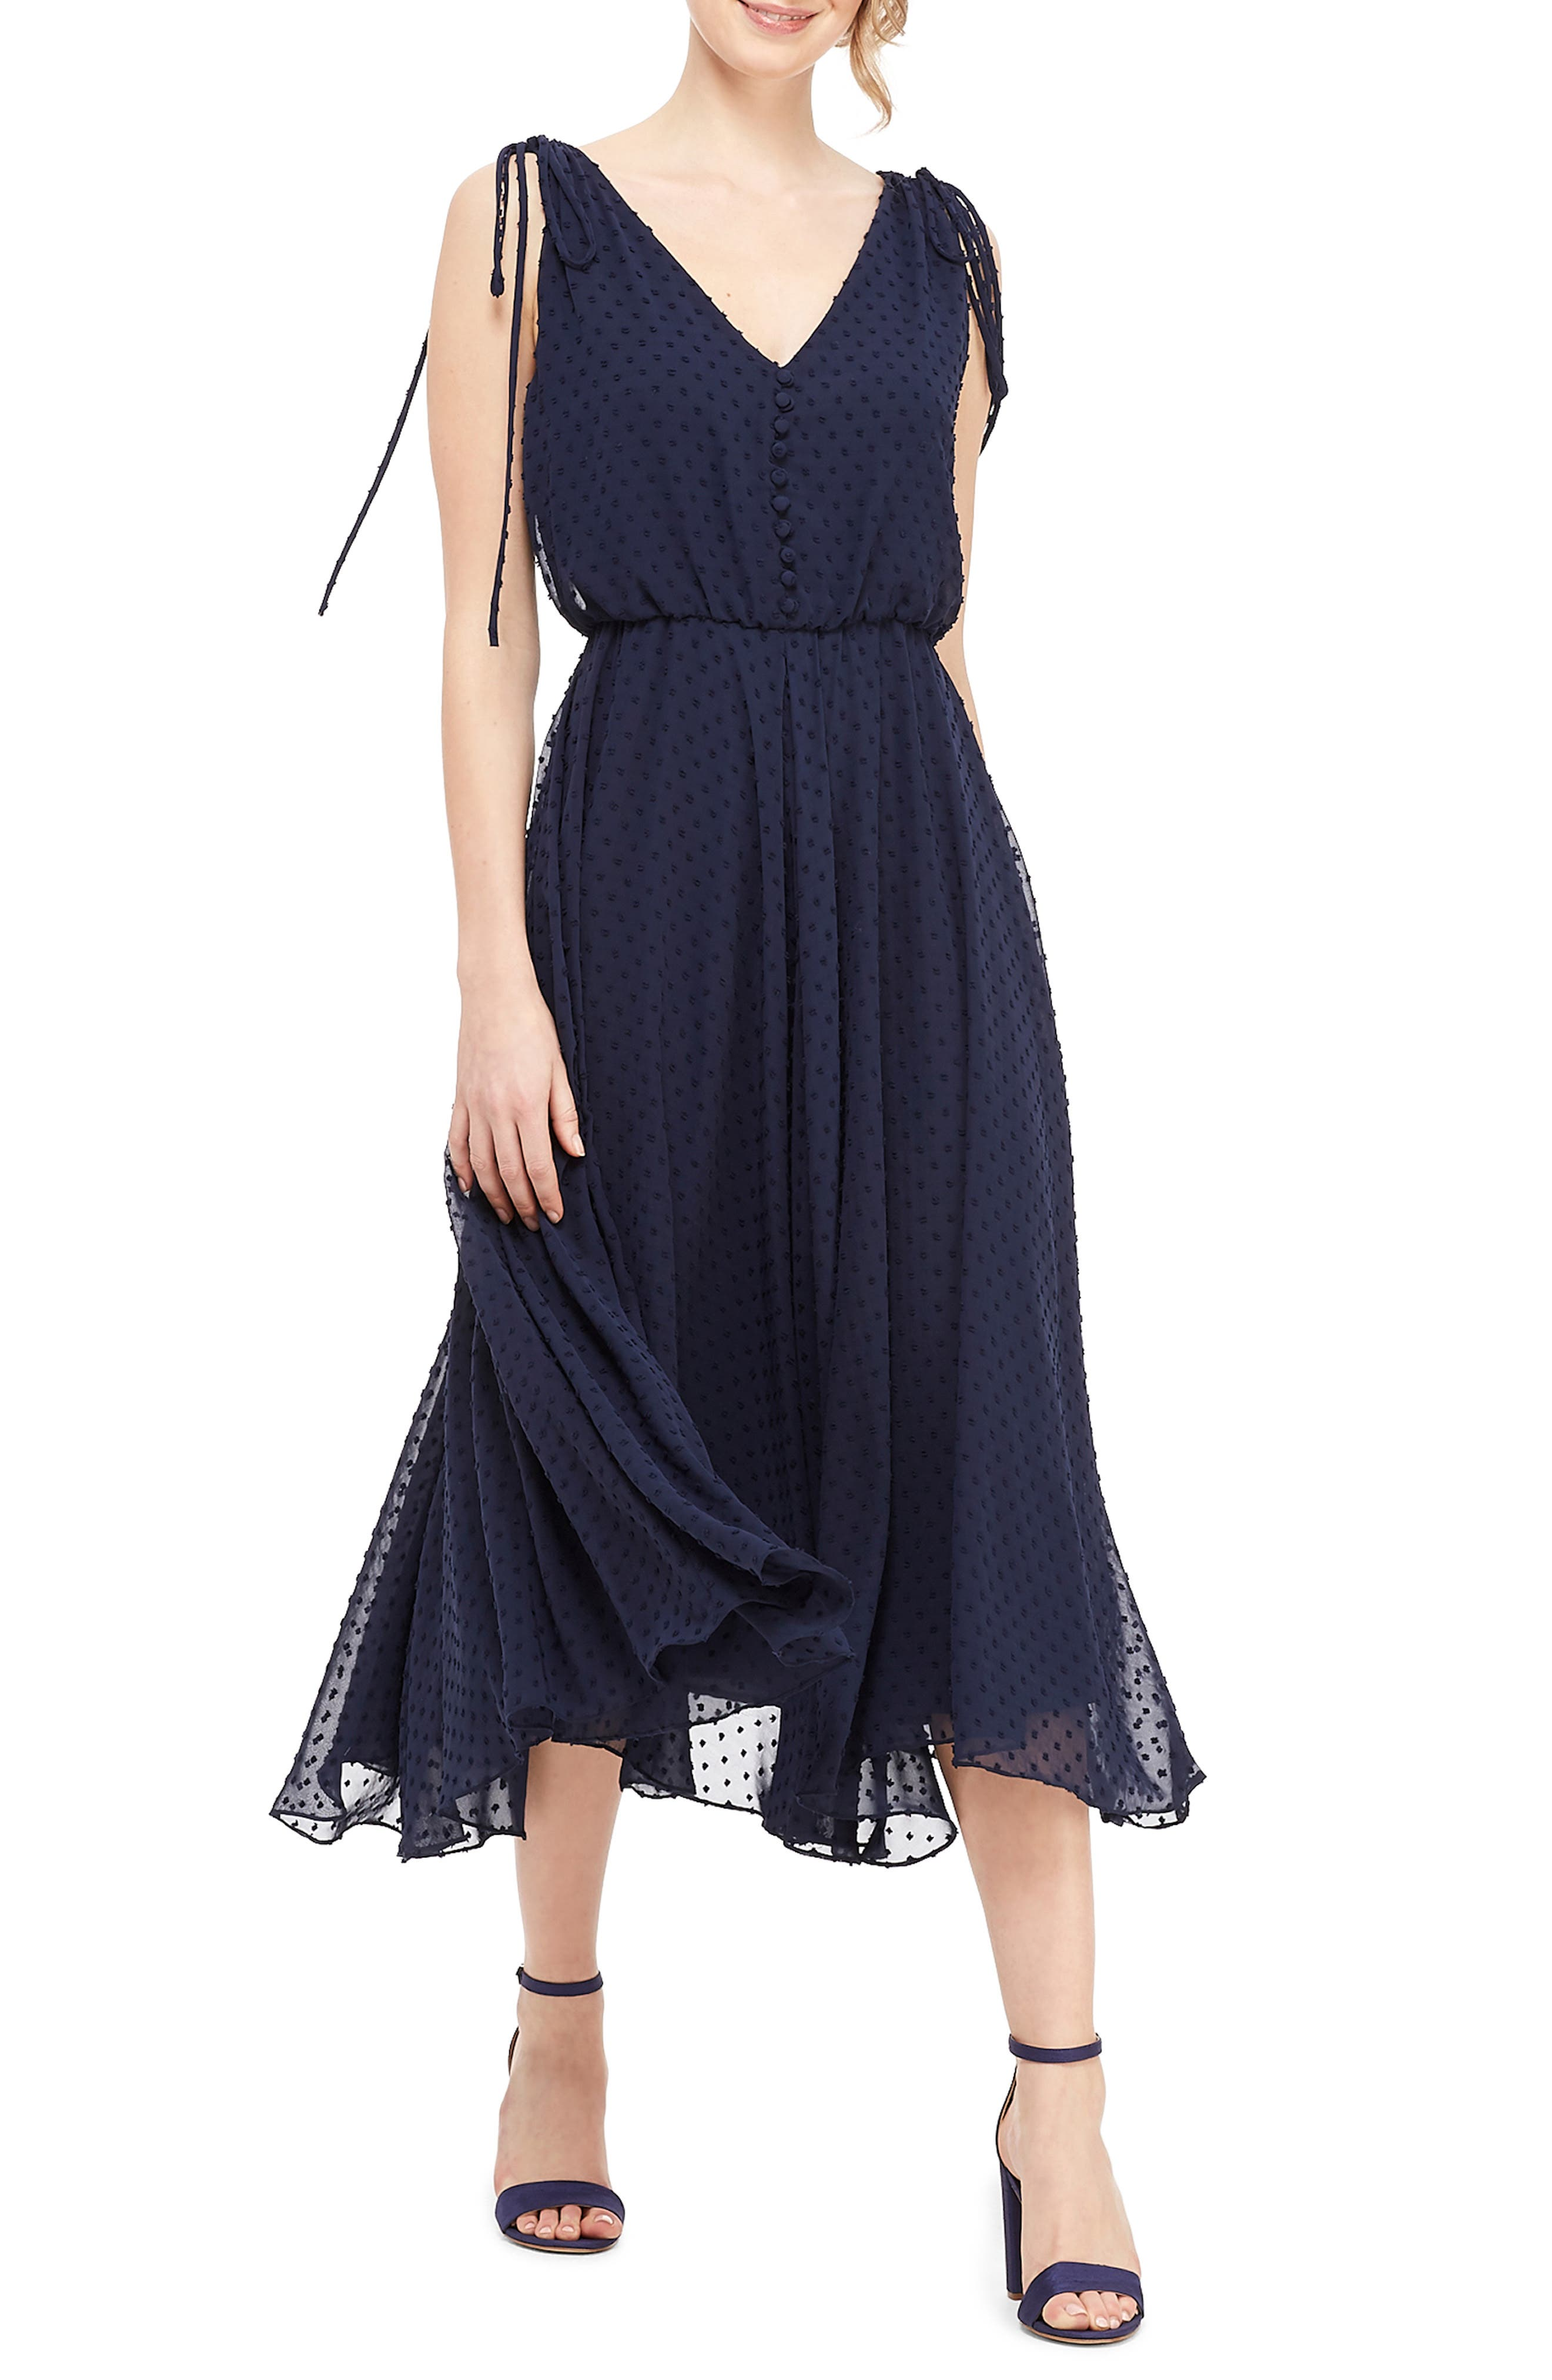 Gal Meets Glam Collection Hilary Clip Dot Chiffon Midi Dress, Blue